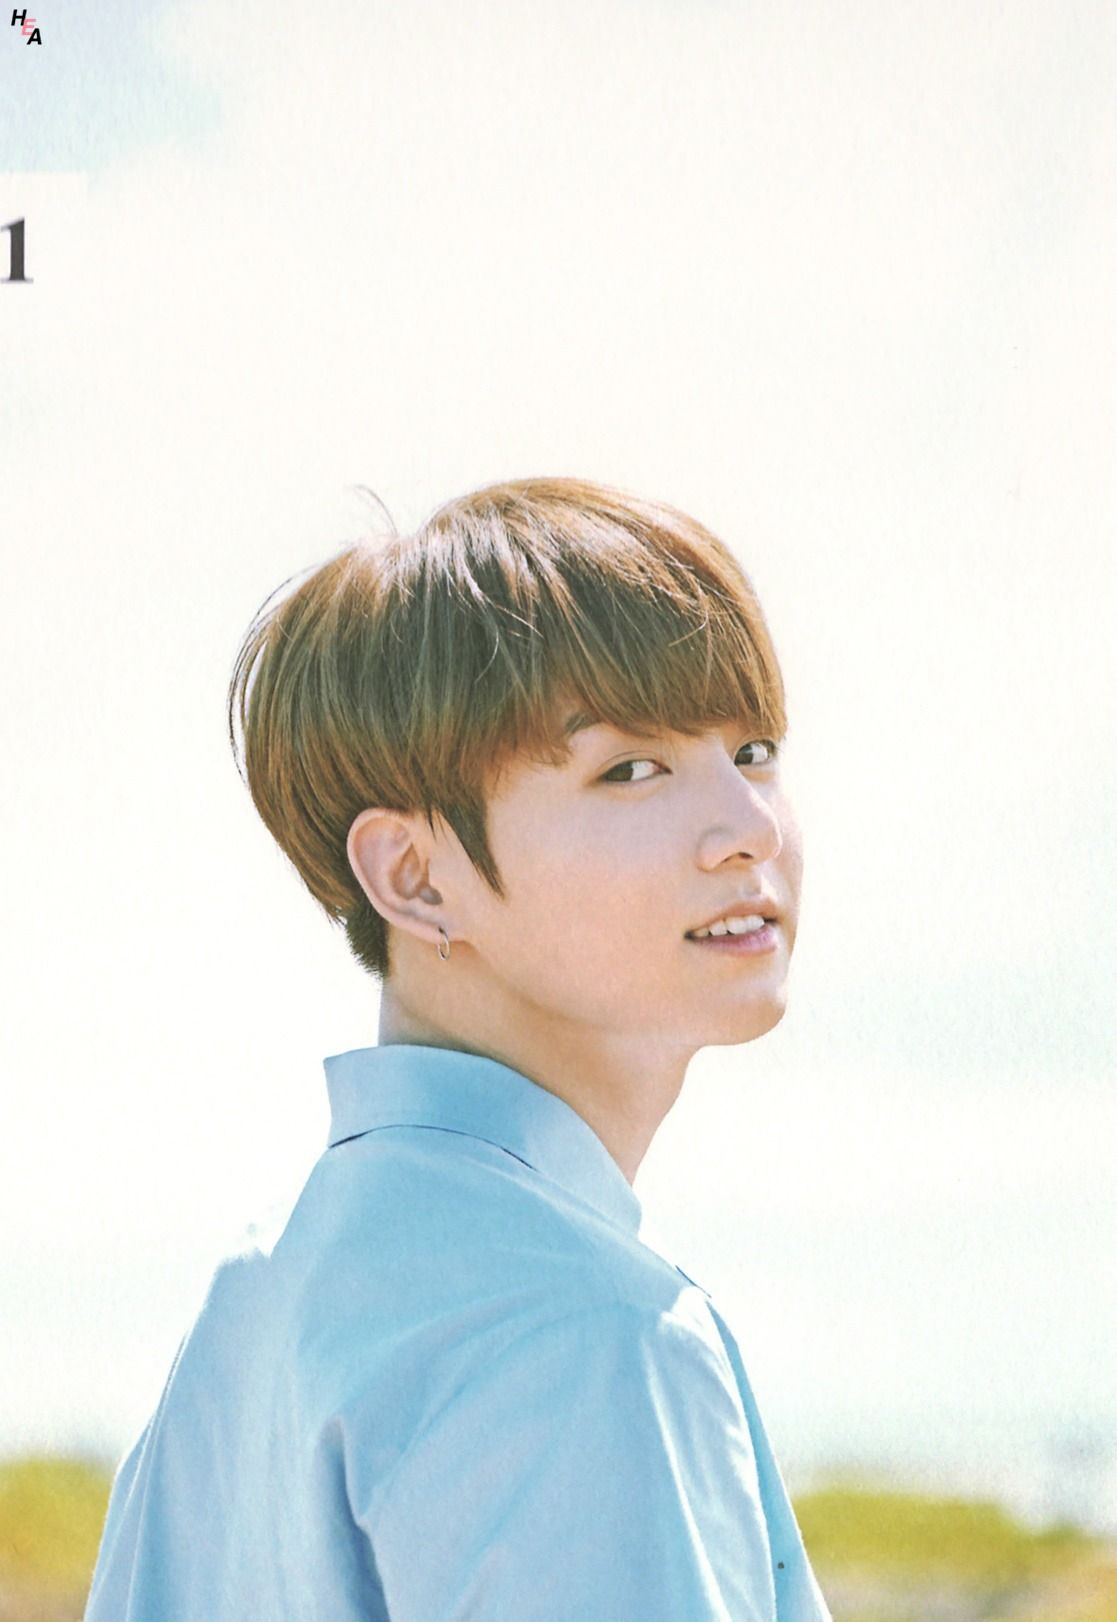 Bts 방탄소년단 love yourself 轉 tear 039singularity039 comeback trailer - 1 6